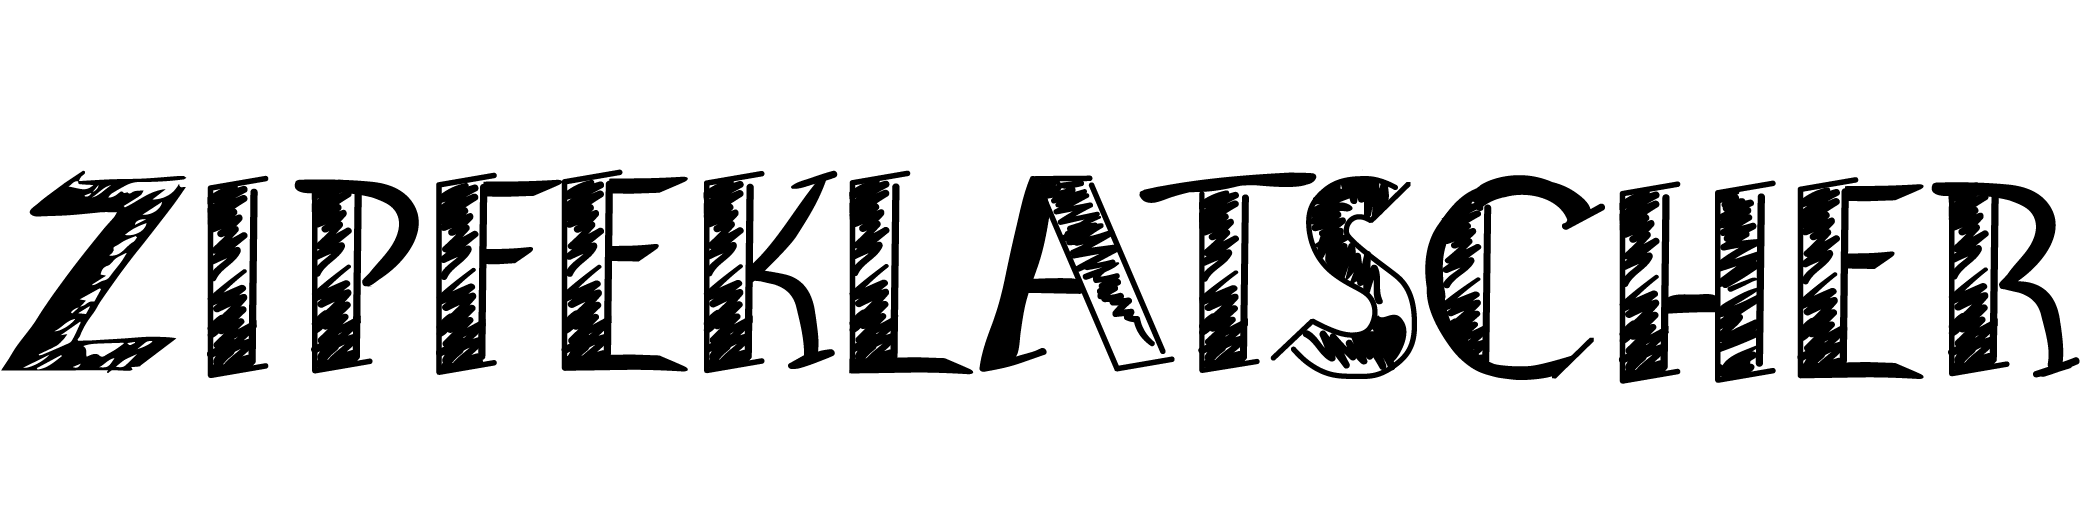 Schriftzug_Zipfiklatscher_Zeichenfläche-1-Kopie